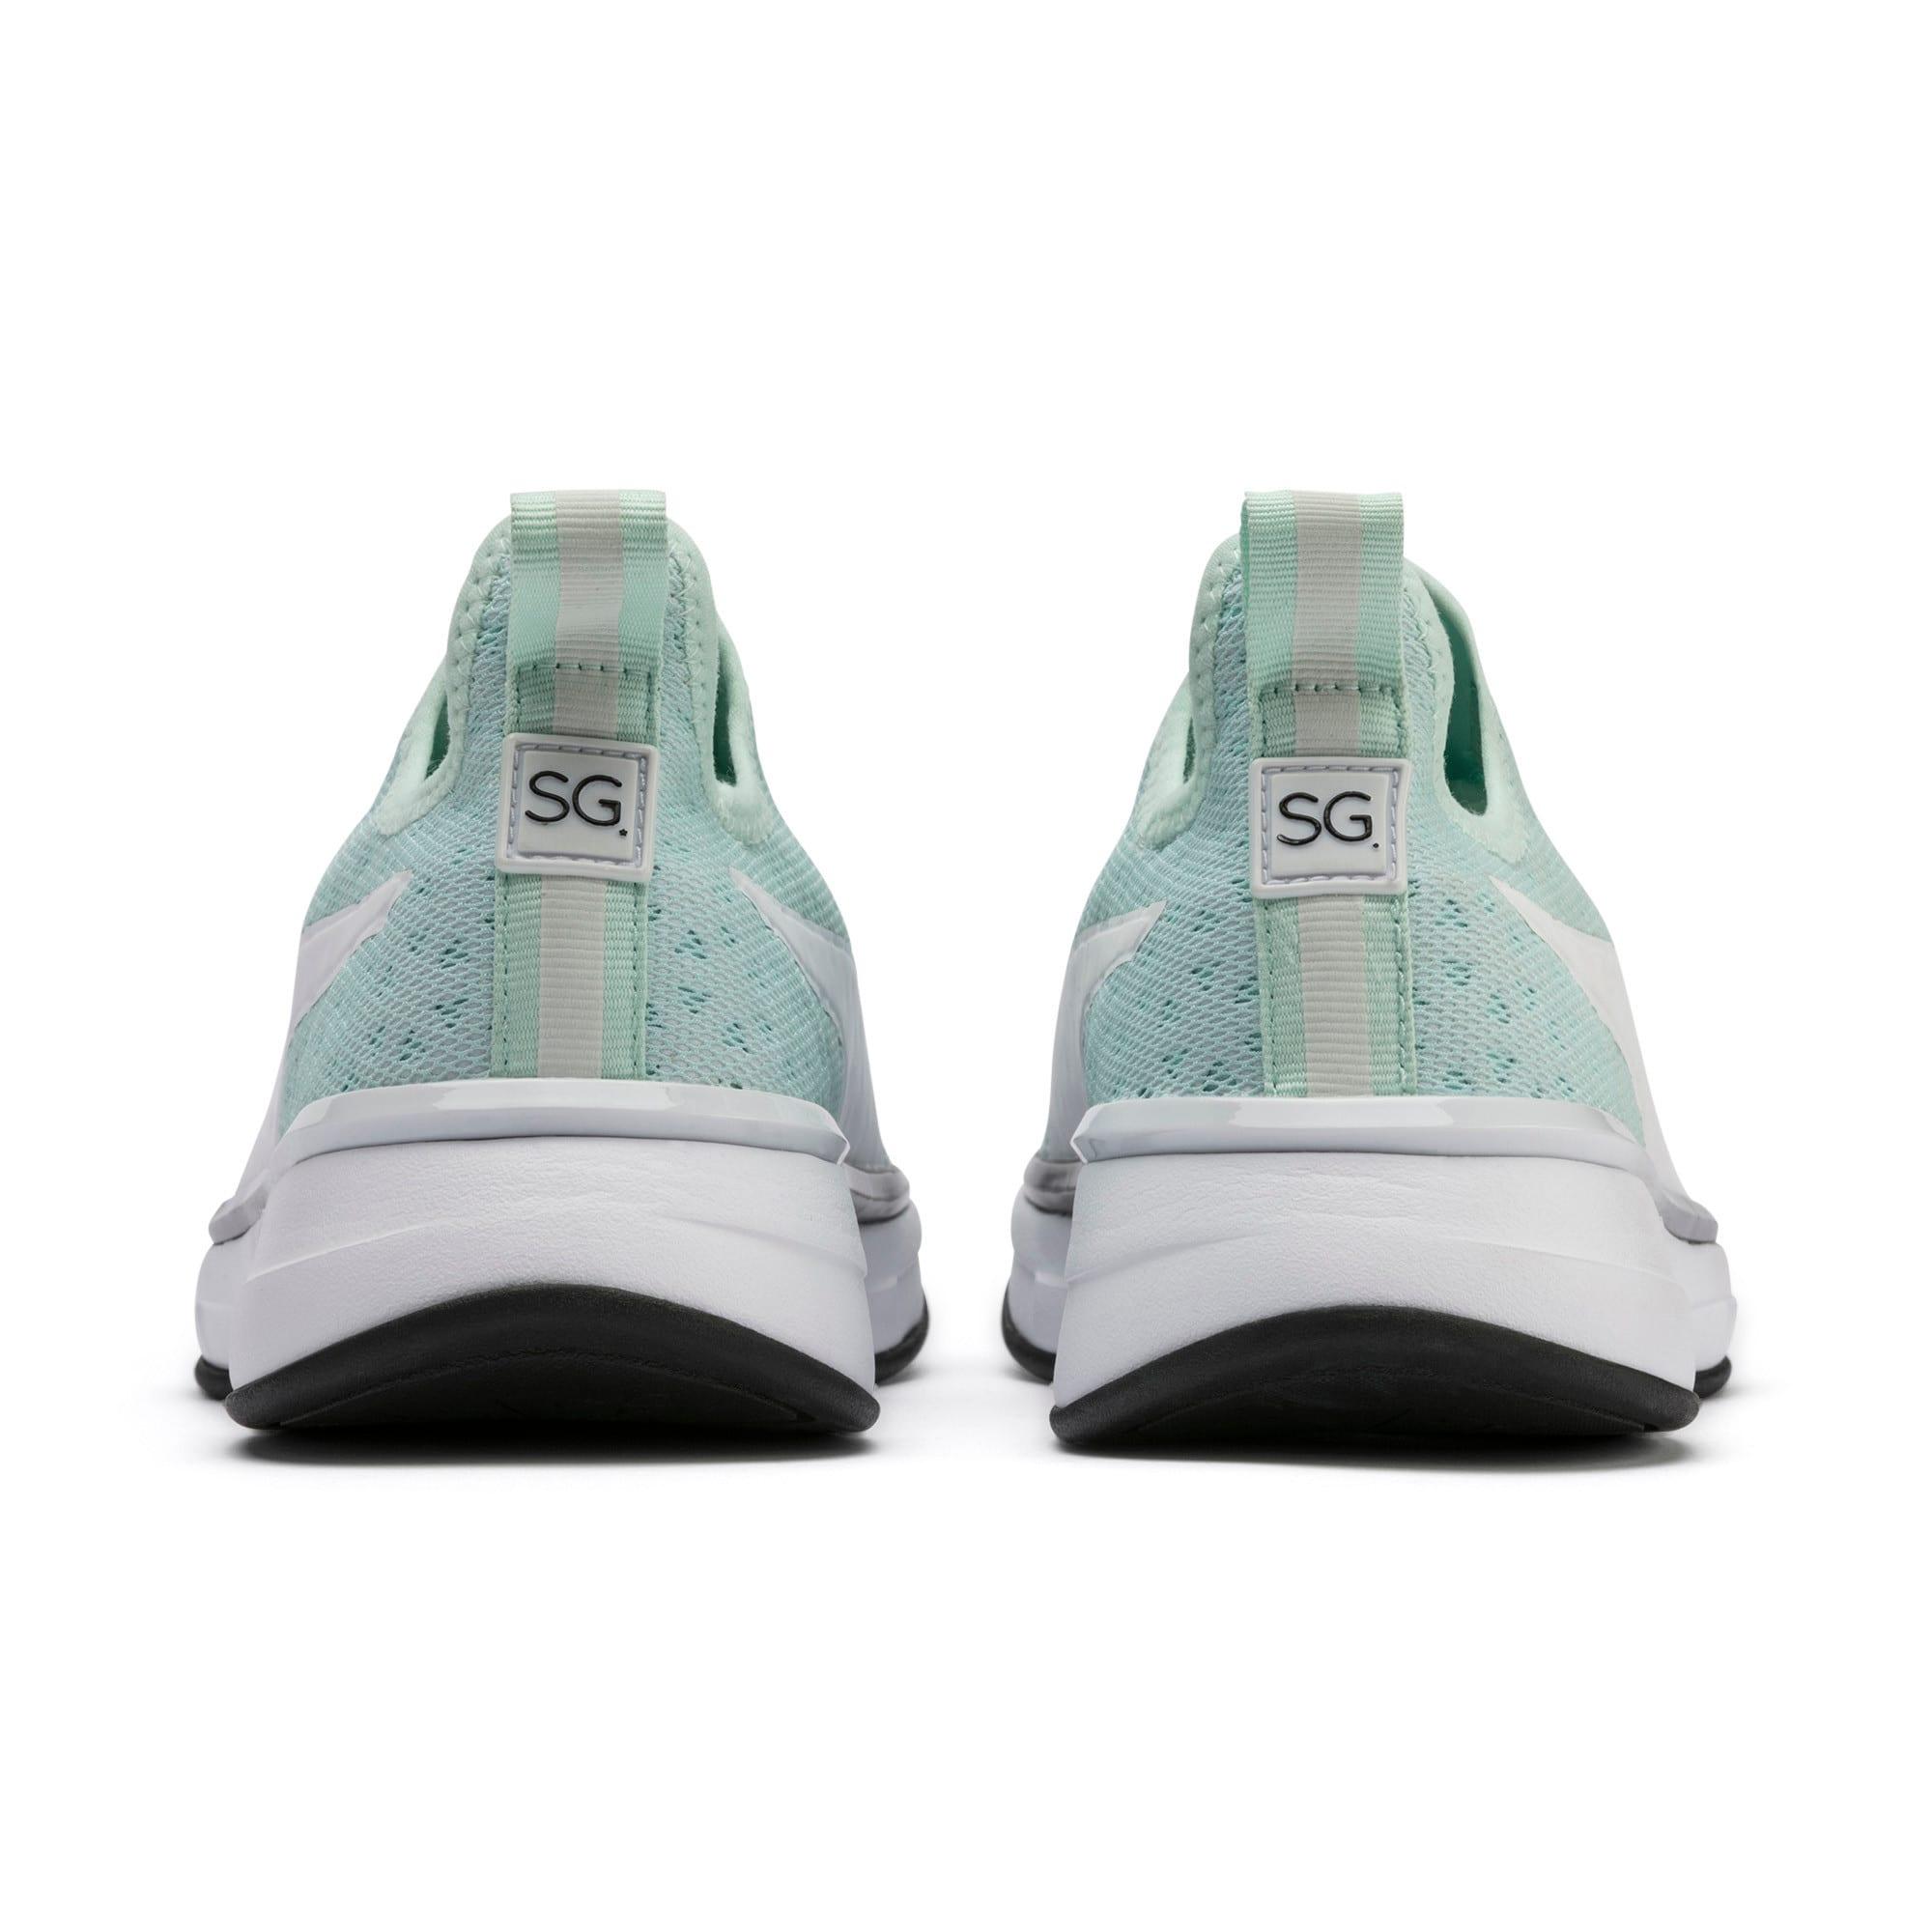 Thumbnail 4 of PUMA x SELENA GOMEZ Slip-On Women's Training Shoes, Fair Aqua-Puma Black, medium